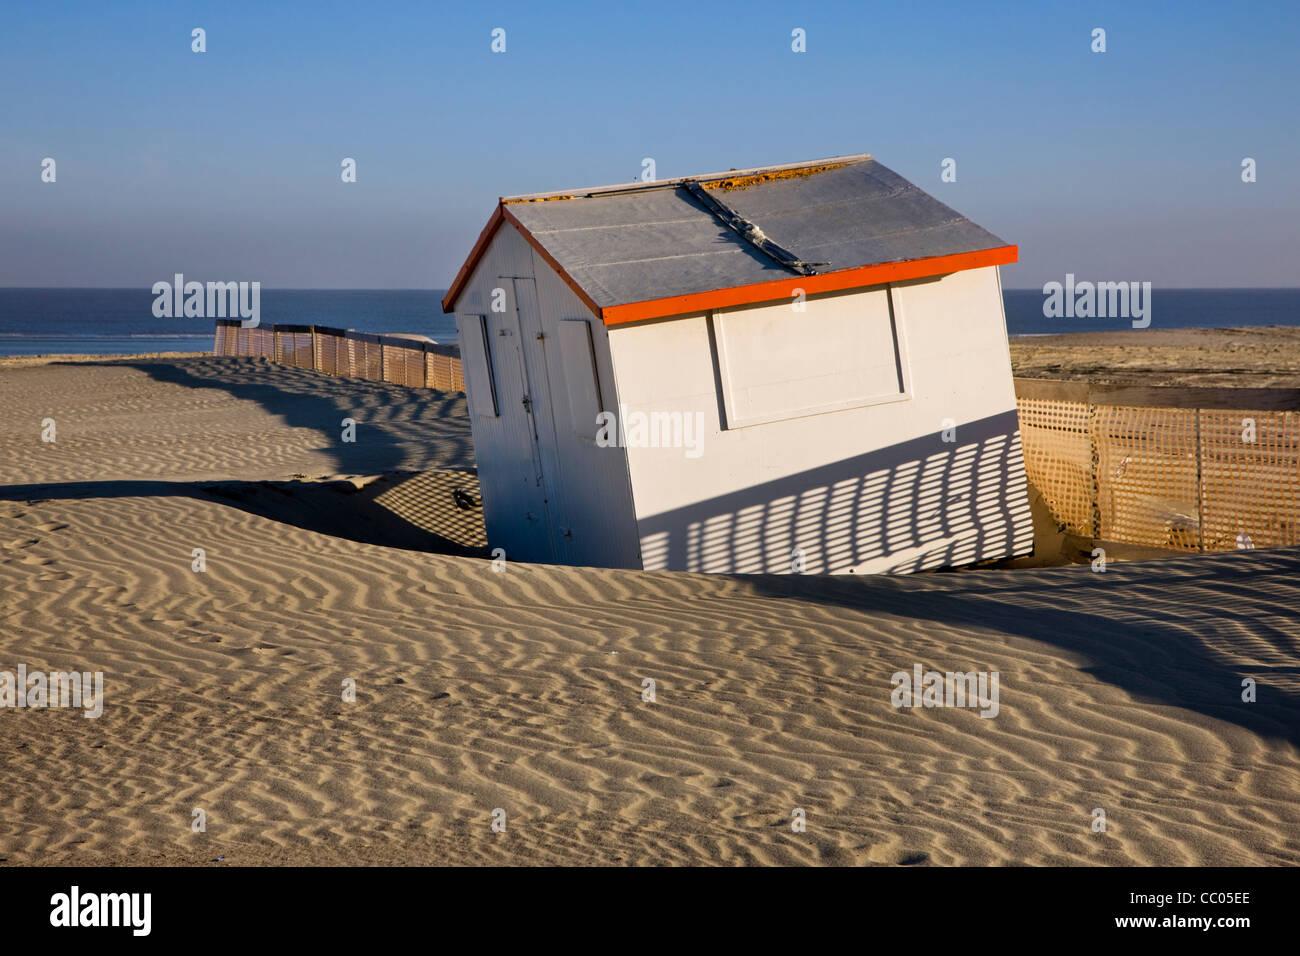 Beach cabin and sand ripples along the North Sea coast, Belgium - Stock Image